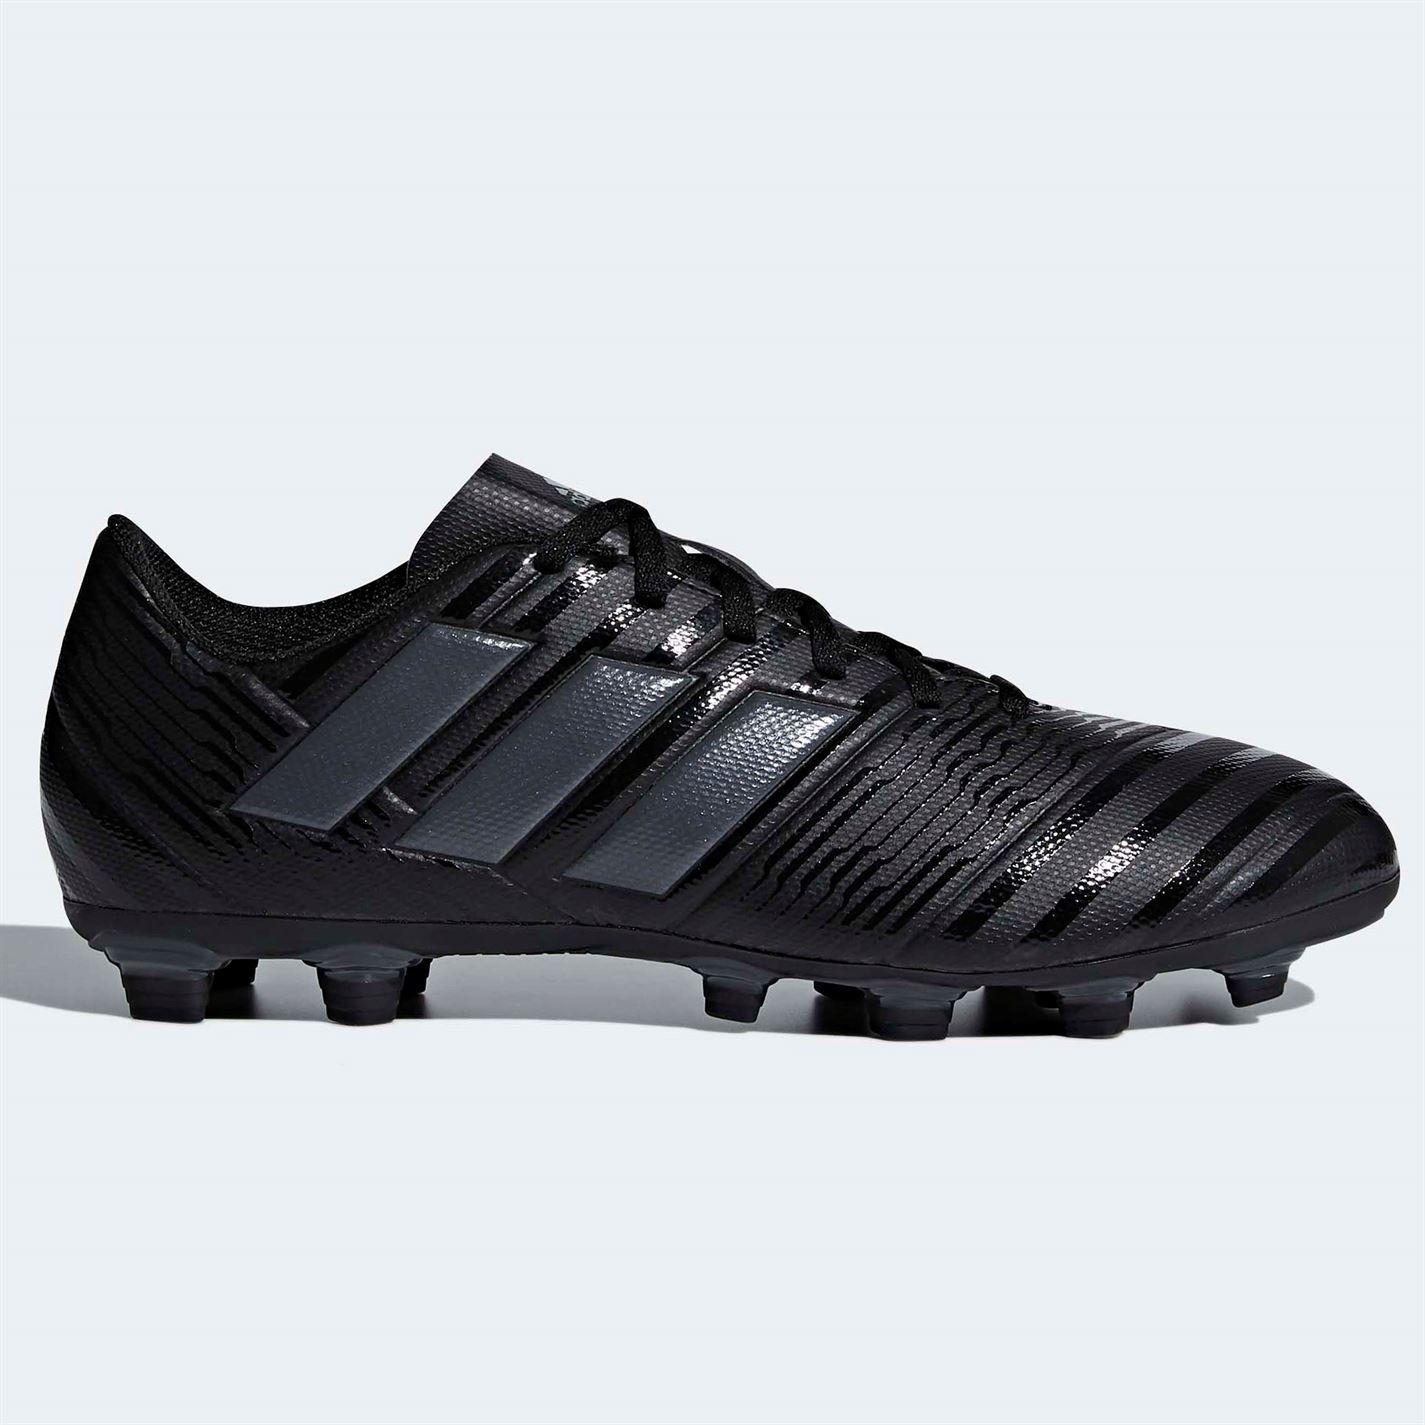 1f603ff75e00 ... adidas Nemeziz 17.4 FG Firm Ground Football Boots Mens Black Soccer  Shoes Cleats ...